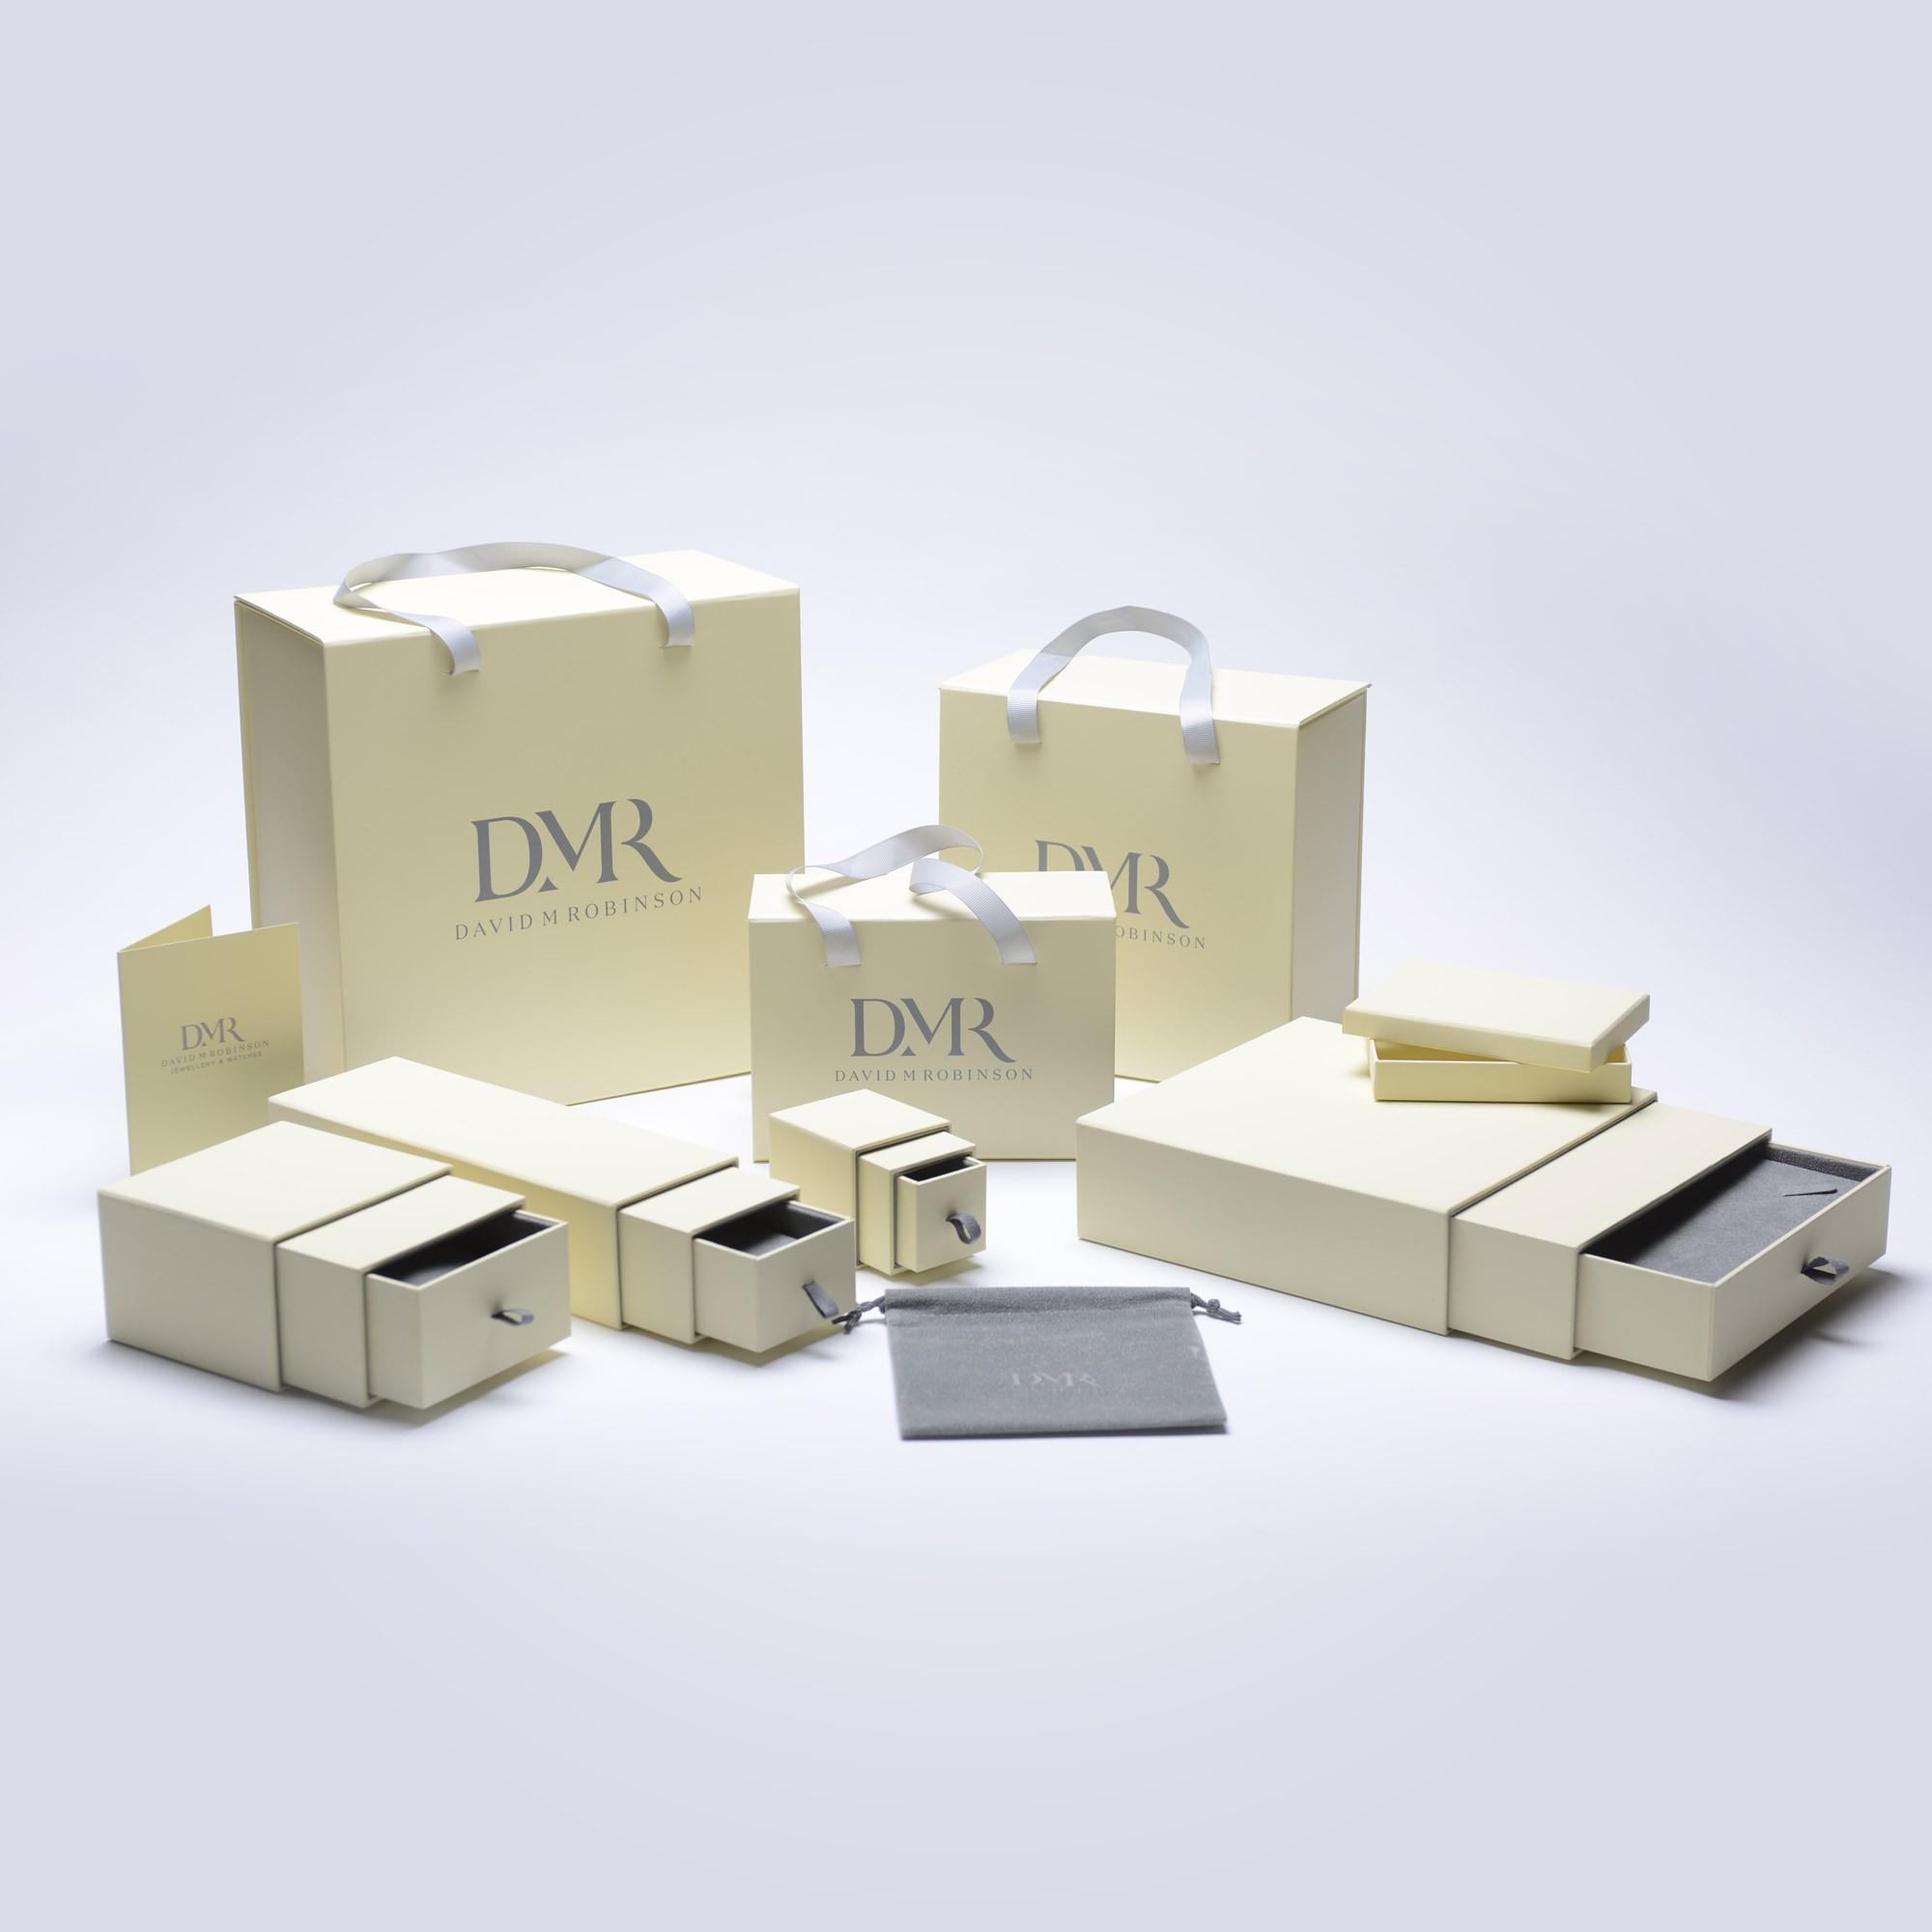 Hopscotch White Gold Diamond Earrings